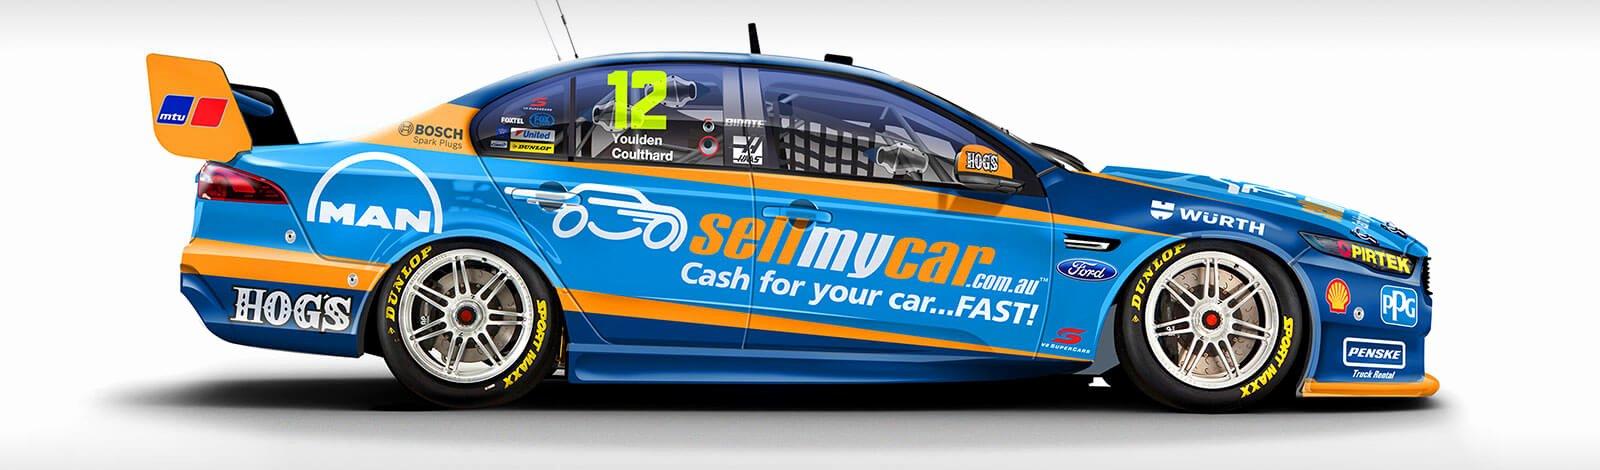 Race Car Sponsorship Packages Elegant Cox to Sponsor Penske Race Car